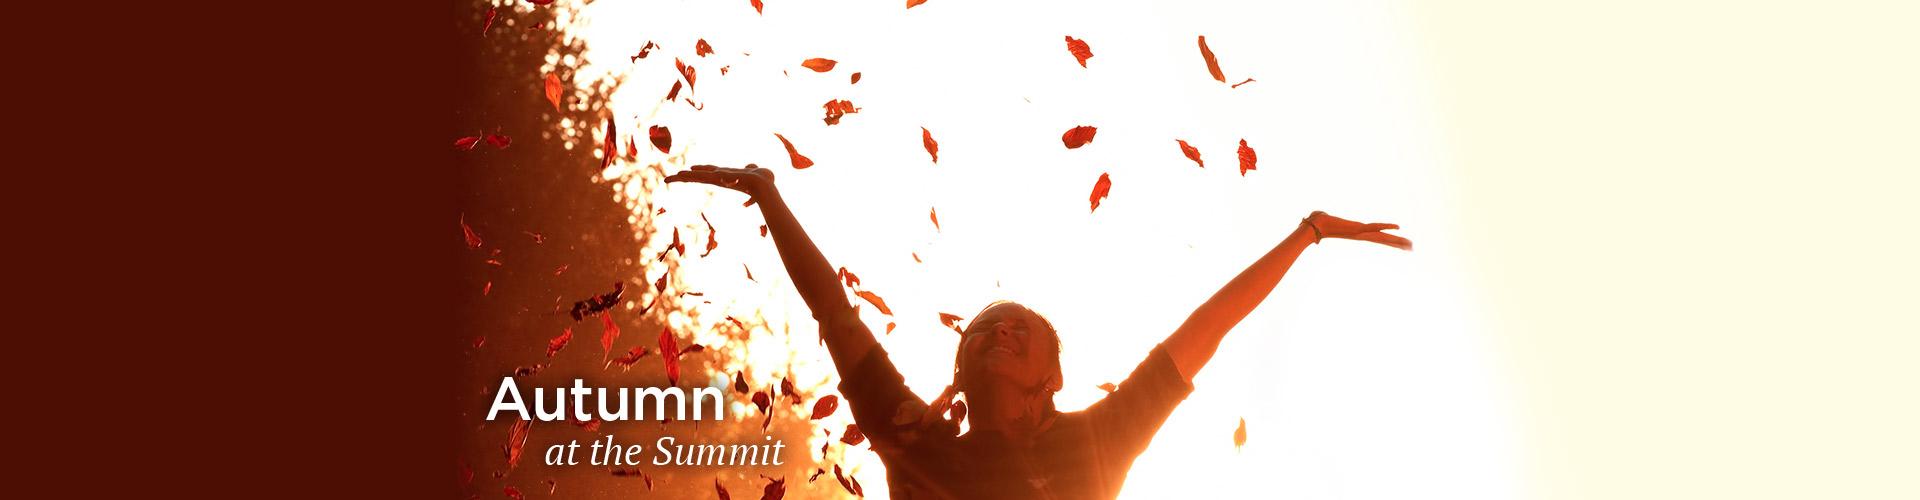 summit_banner_autum-at-the-summit